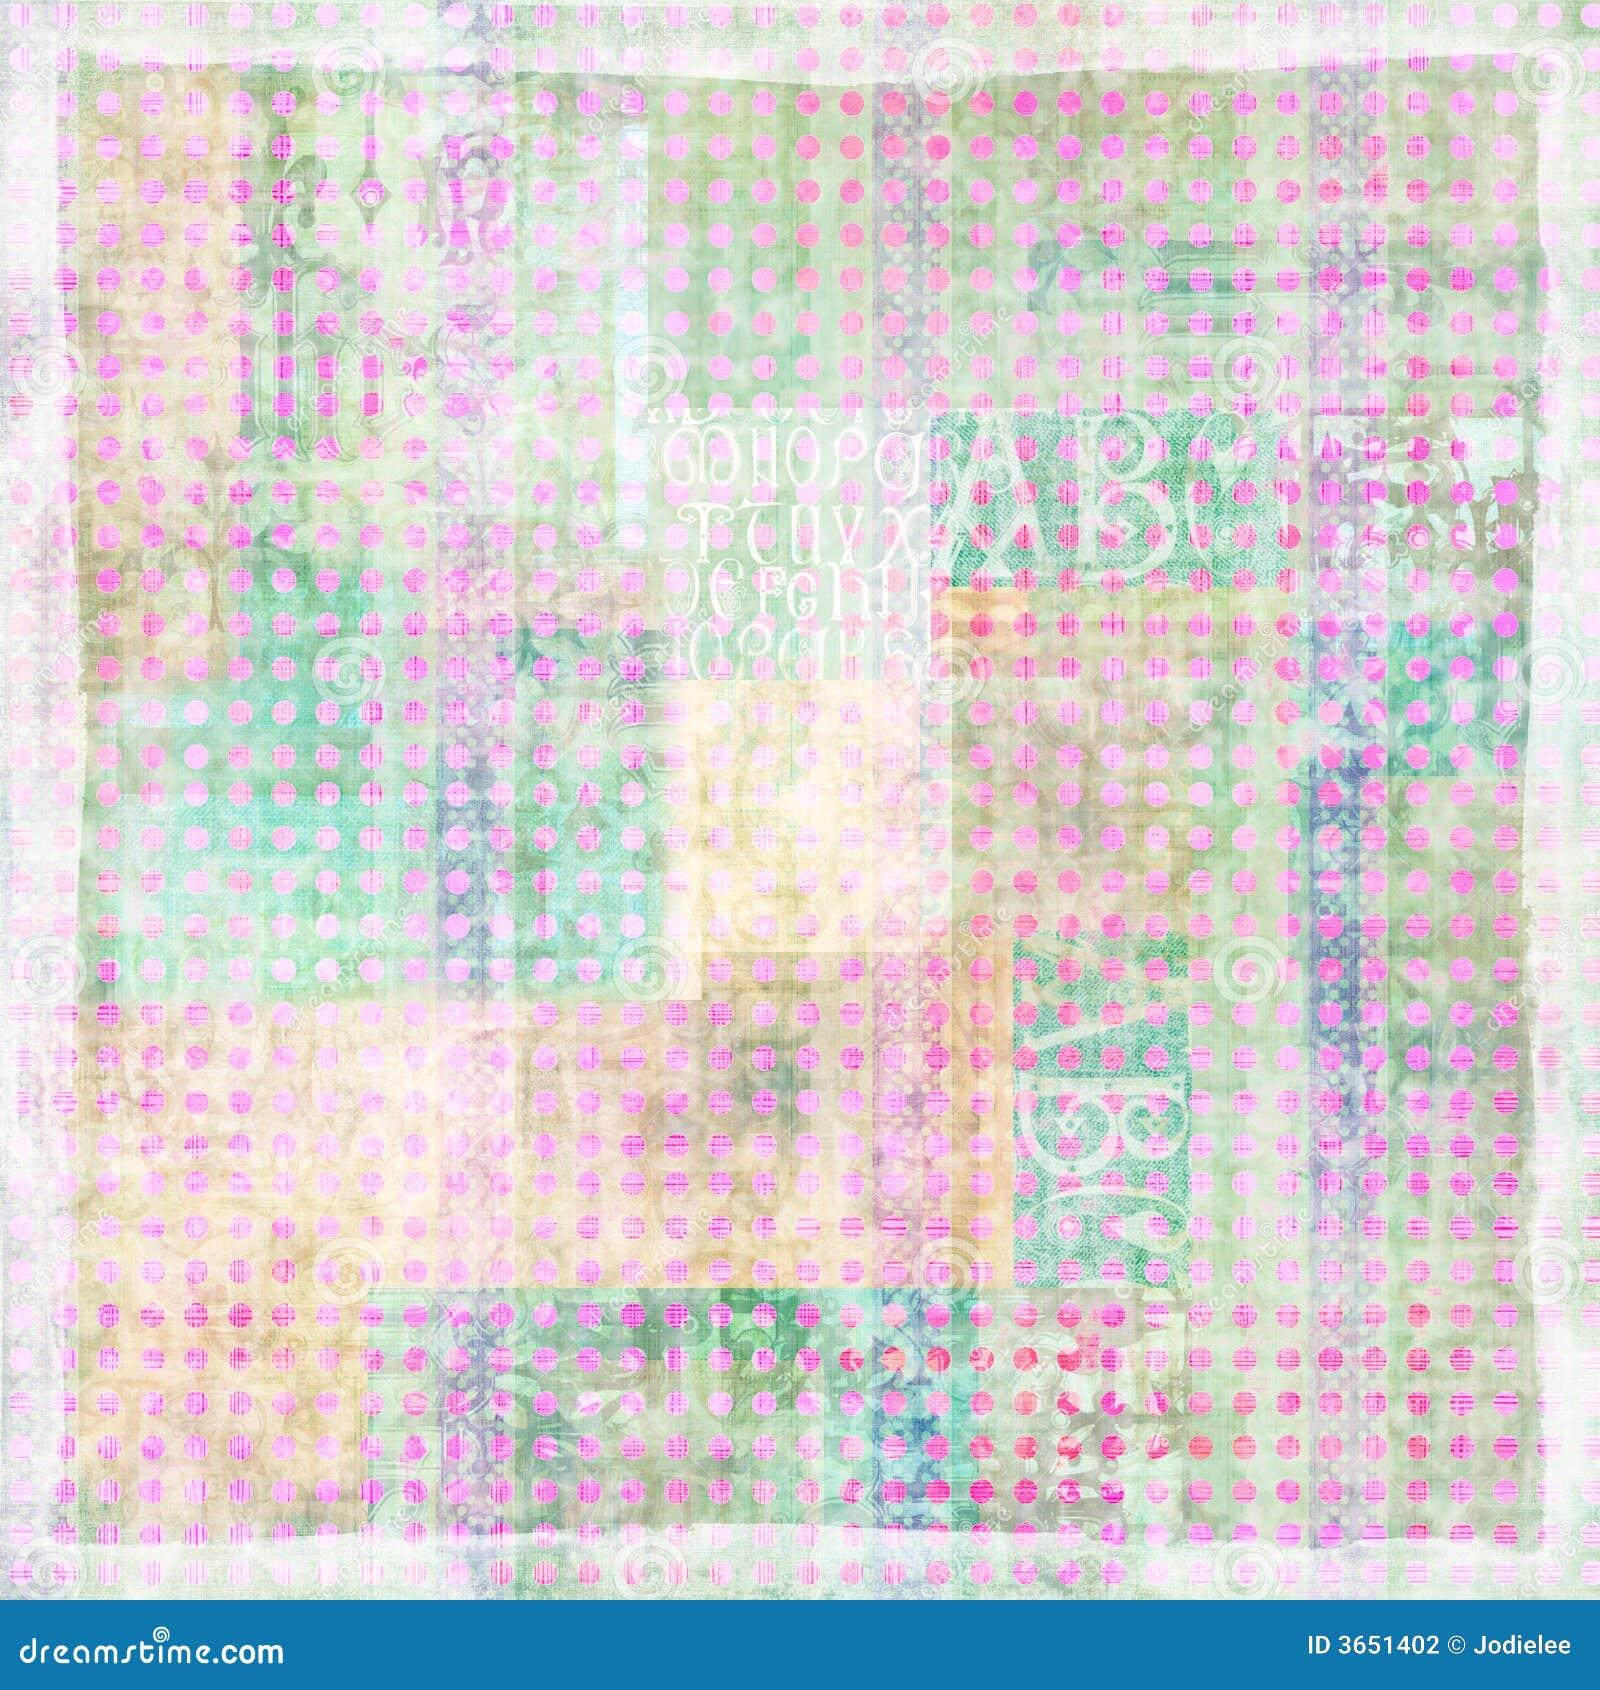 spotted art paper scrapbook background stock illustration